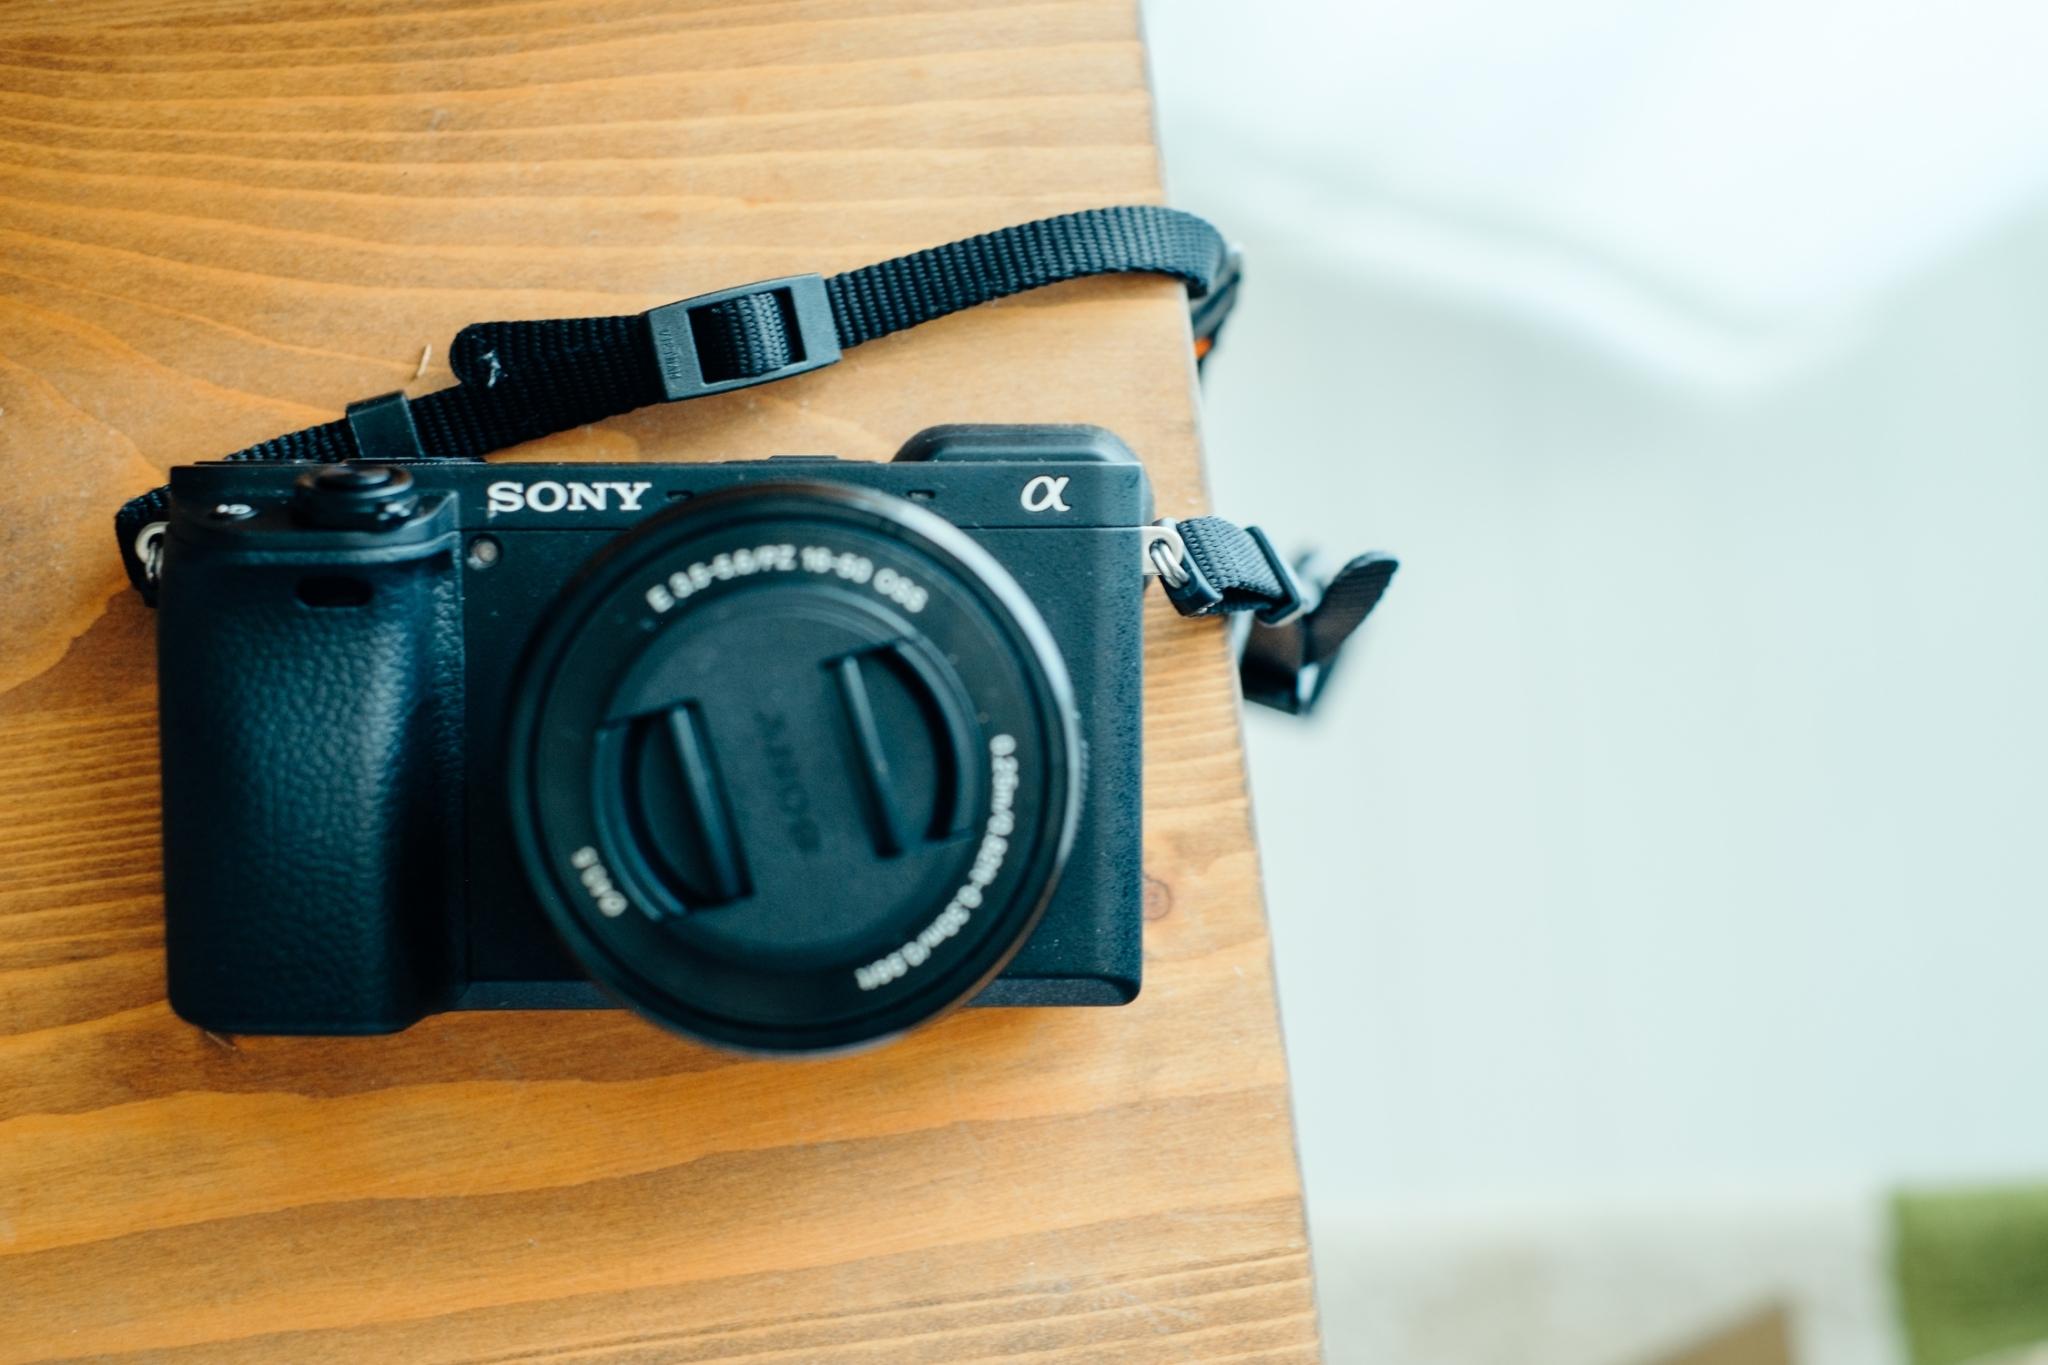 Rentryで初めてのカメラレンタル!利用してみた感想・レビューについて